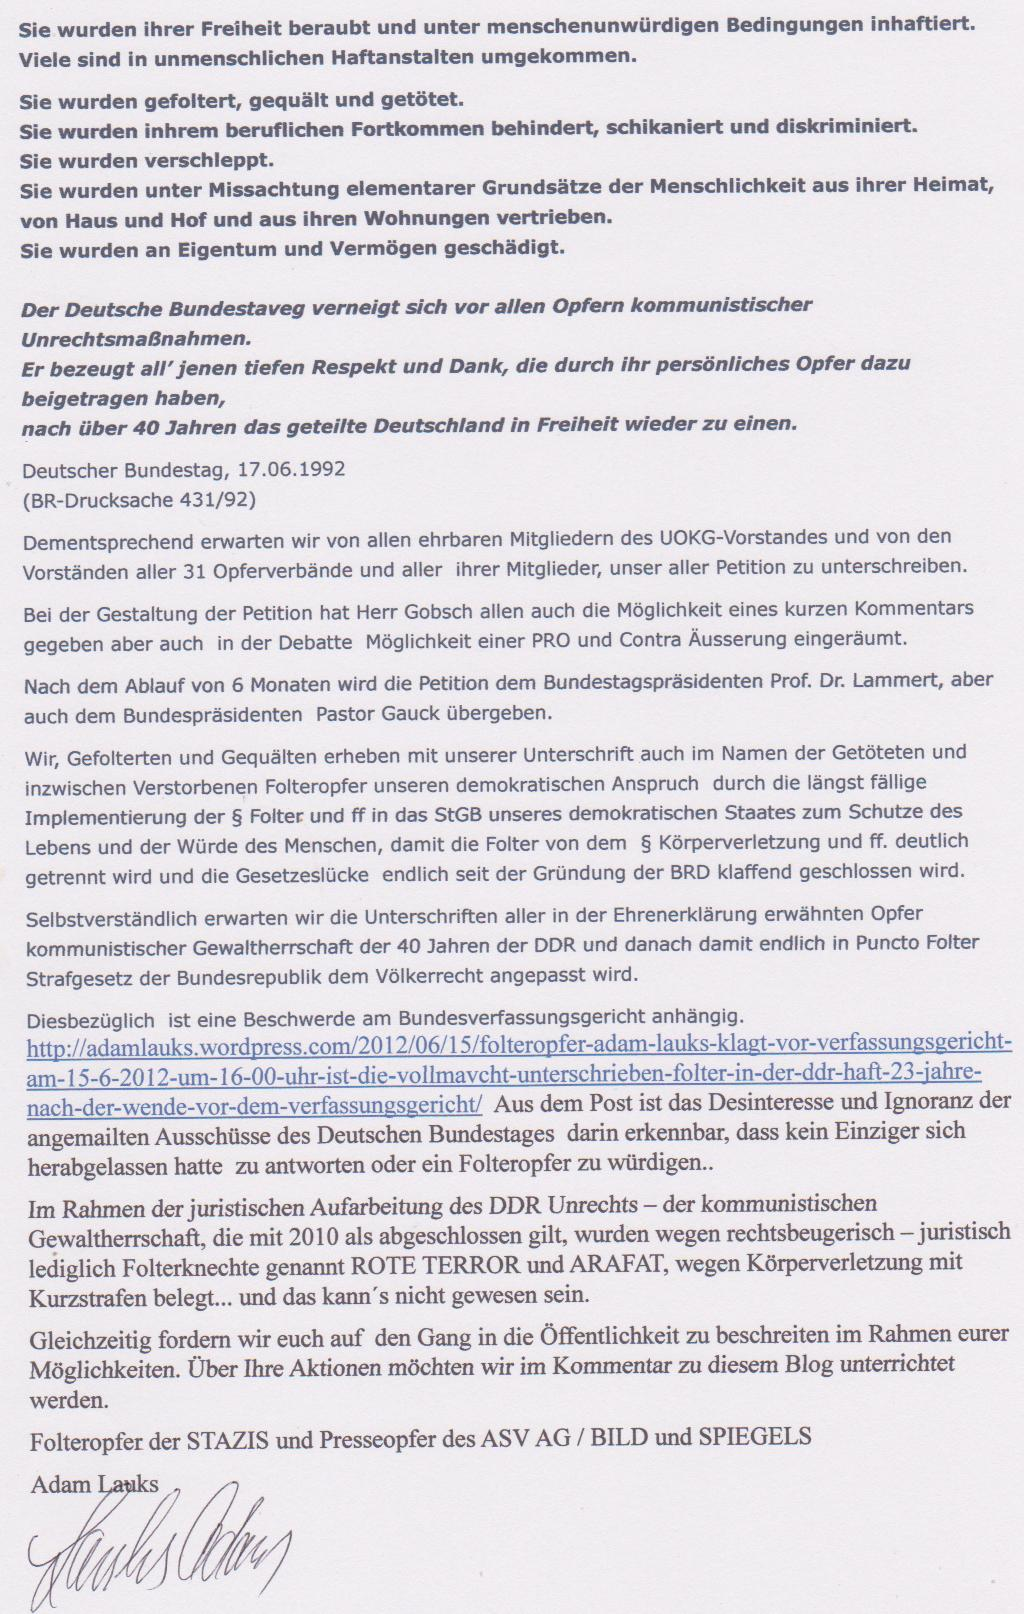 lebenslauf verstorbene vorlage - 28 images - lebenslauf muster ...